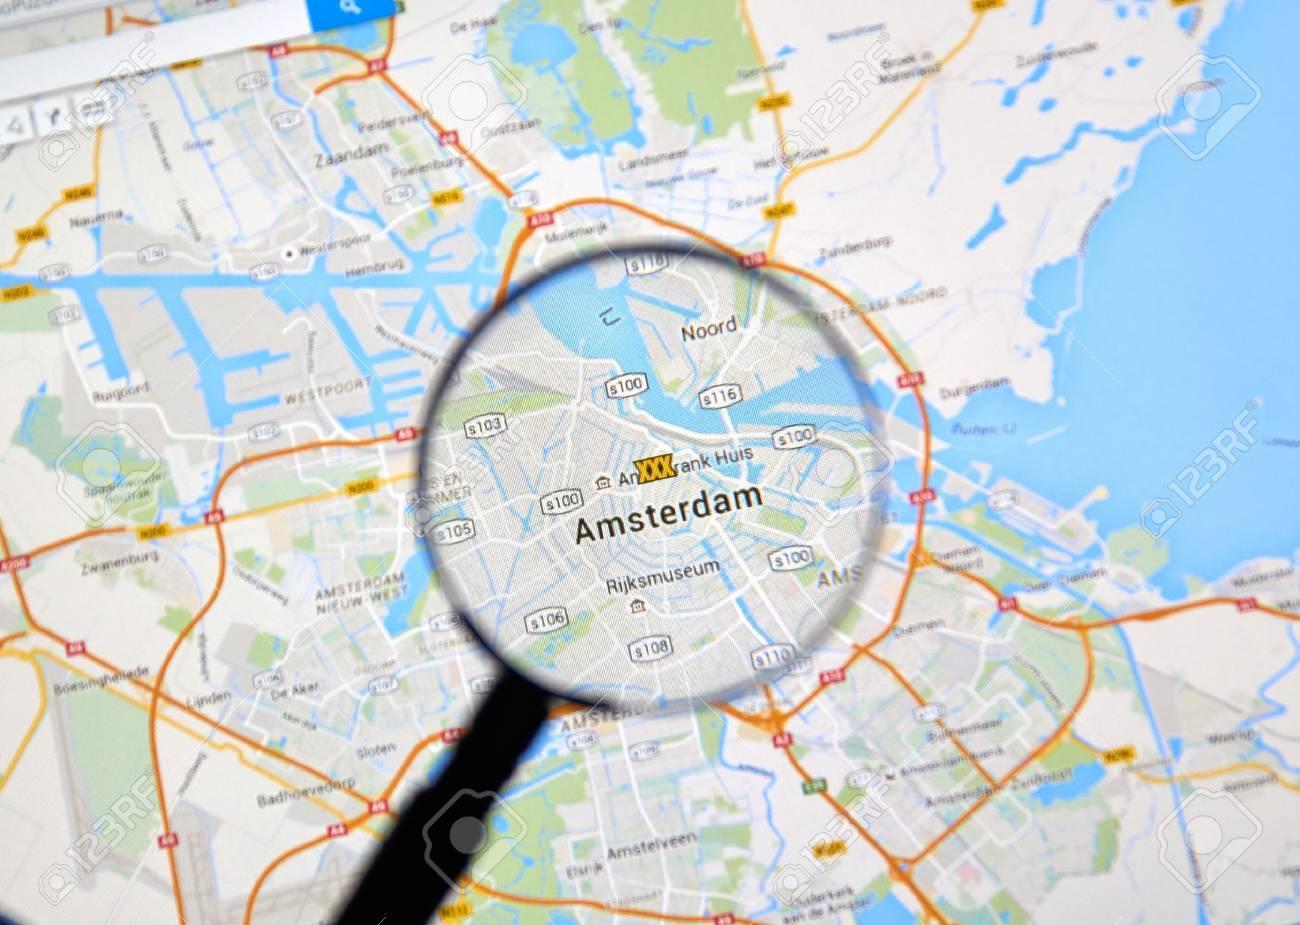 Montreal canad febrero 2016 amsterdam en google maps montreal canad febrero 2016 amsterdam en google maps aplicacin bajo la lupa gumiabroncs Choice Image